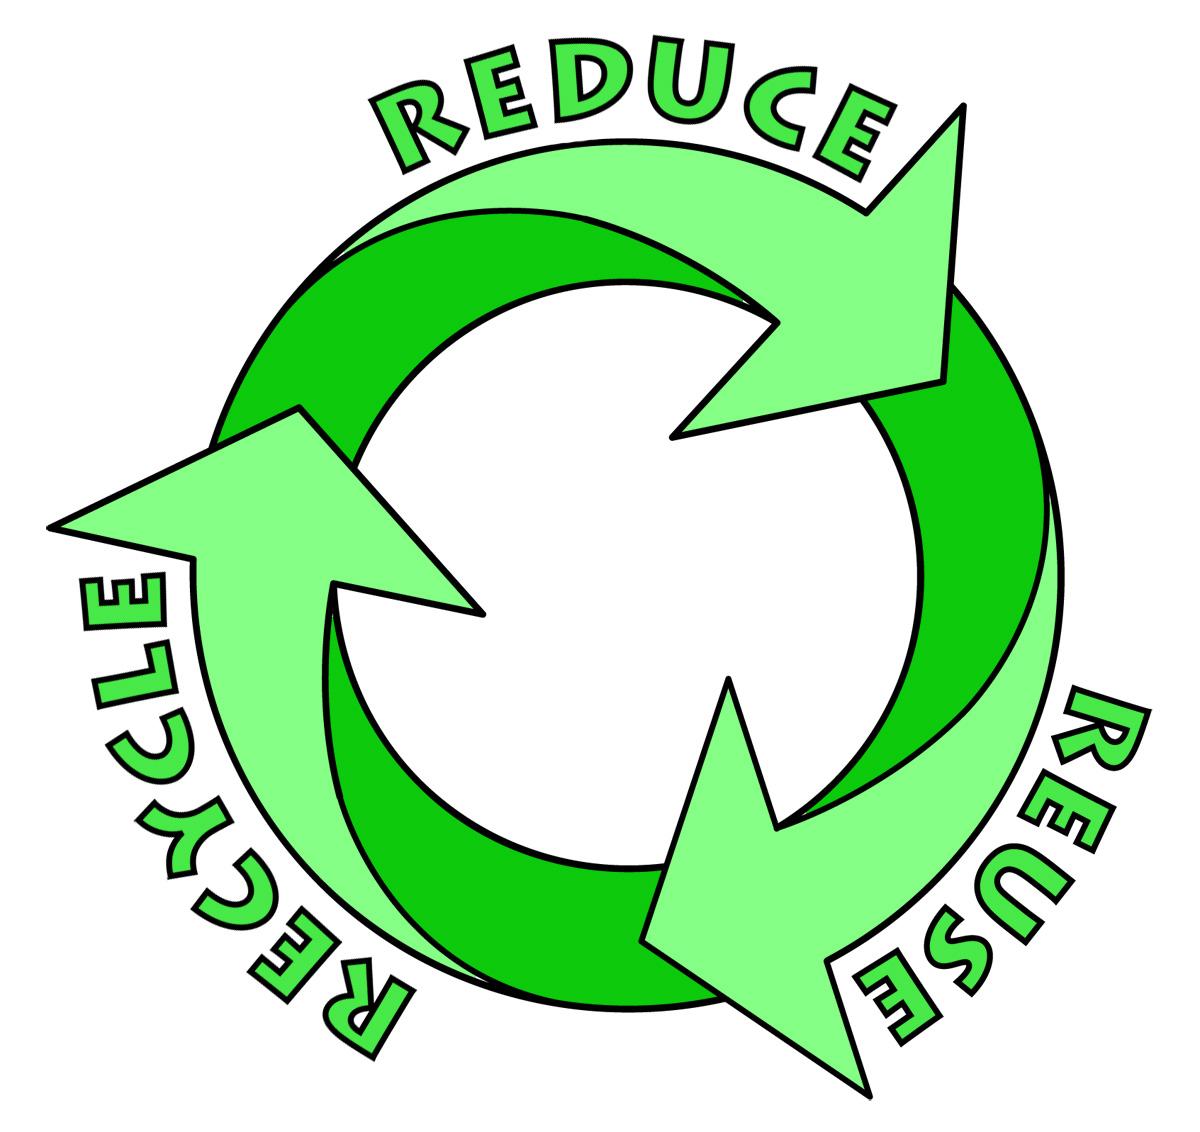 Recycling Clip Art Free | Clipart Panda -Recycling Clip Art Free | Clipart Panda - Free Clipart Images-15